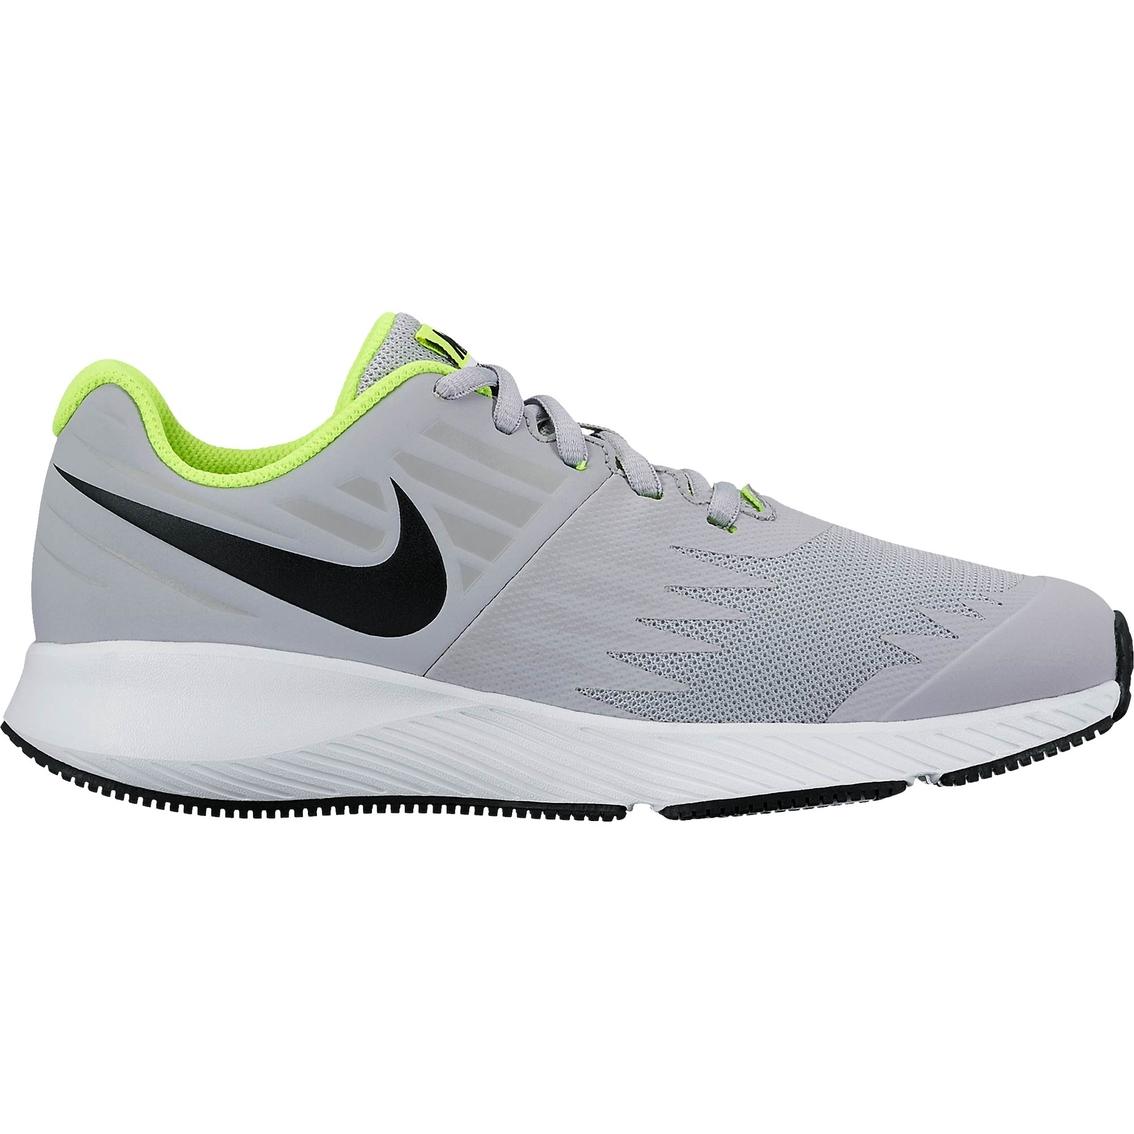 best service 7076f 81eb1 Nike Grade School Boys Star Runner Running Shoes